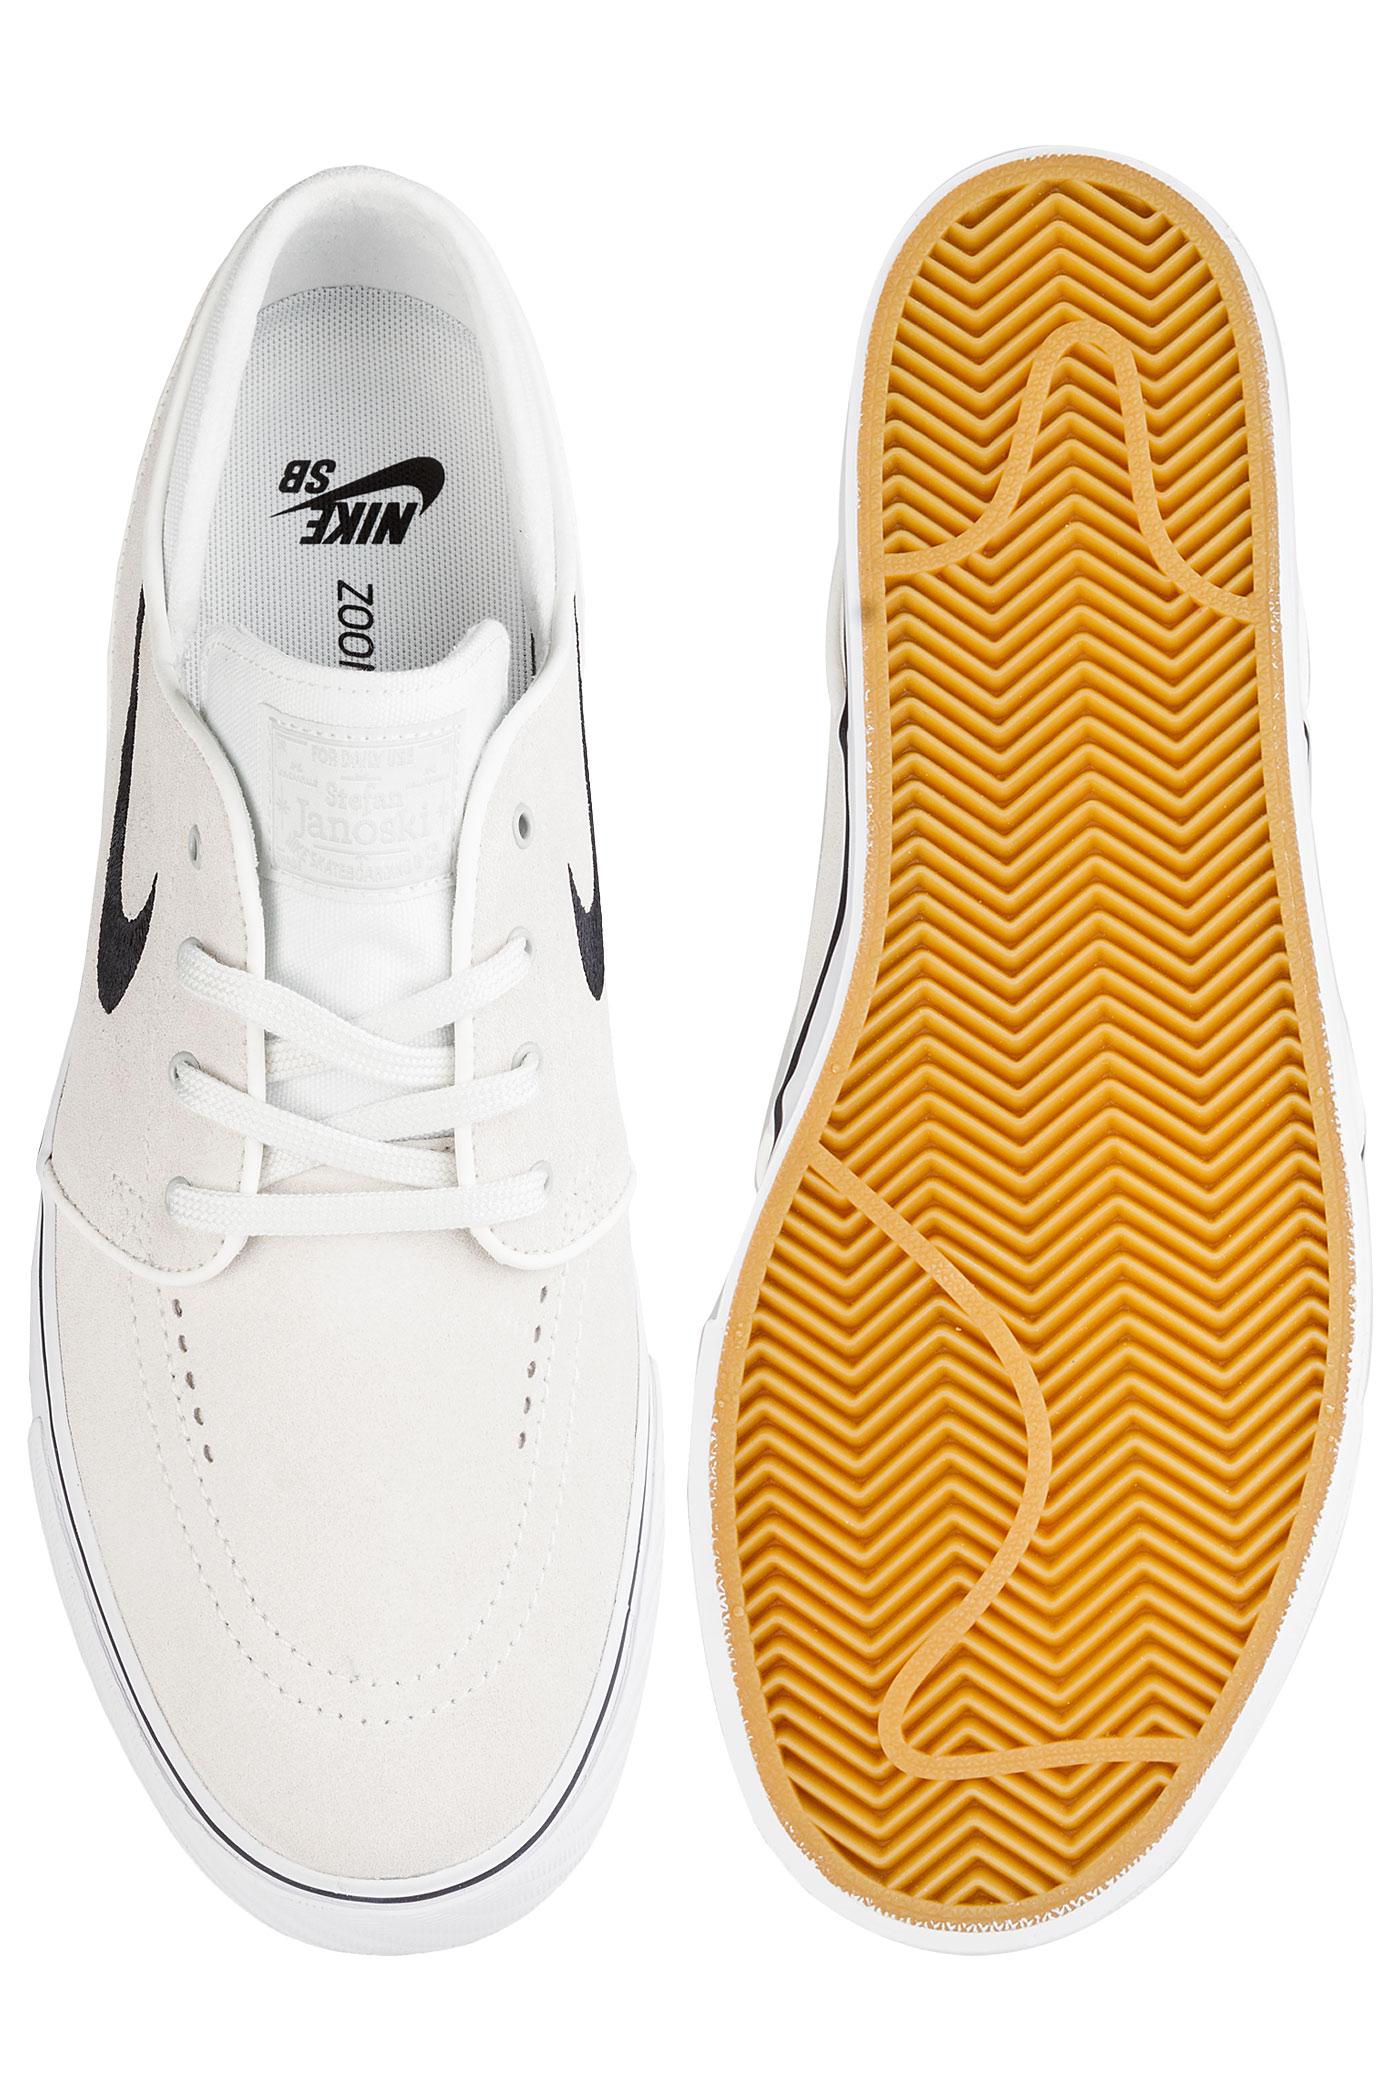 White Chaussuresummit Janoski Sb Zoom Nike Black Stefan tCQrhxsd